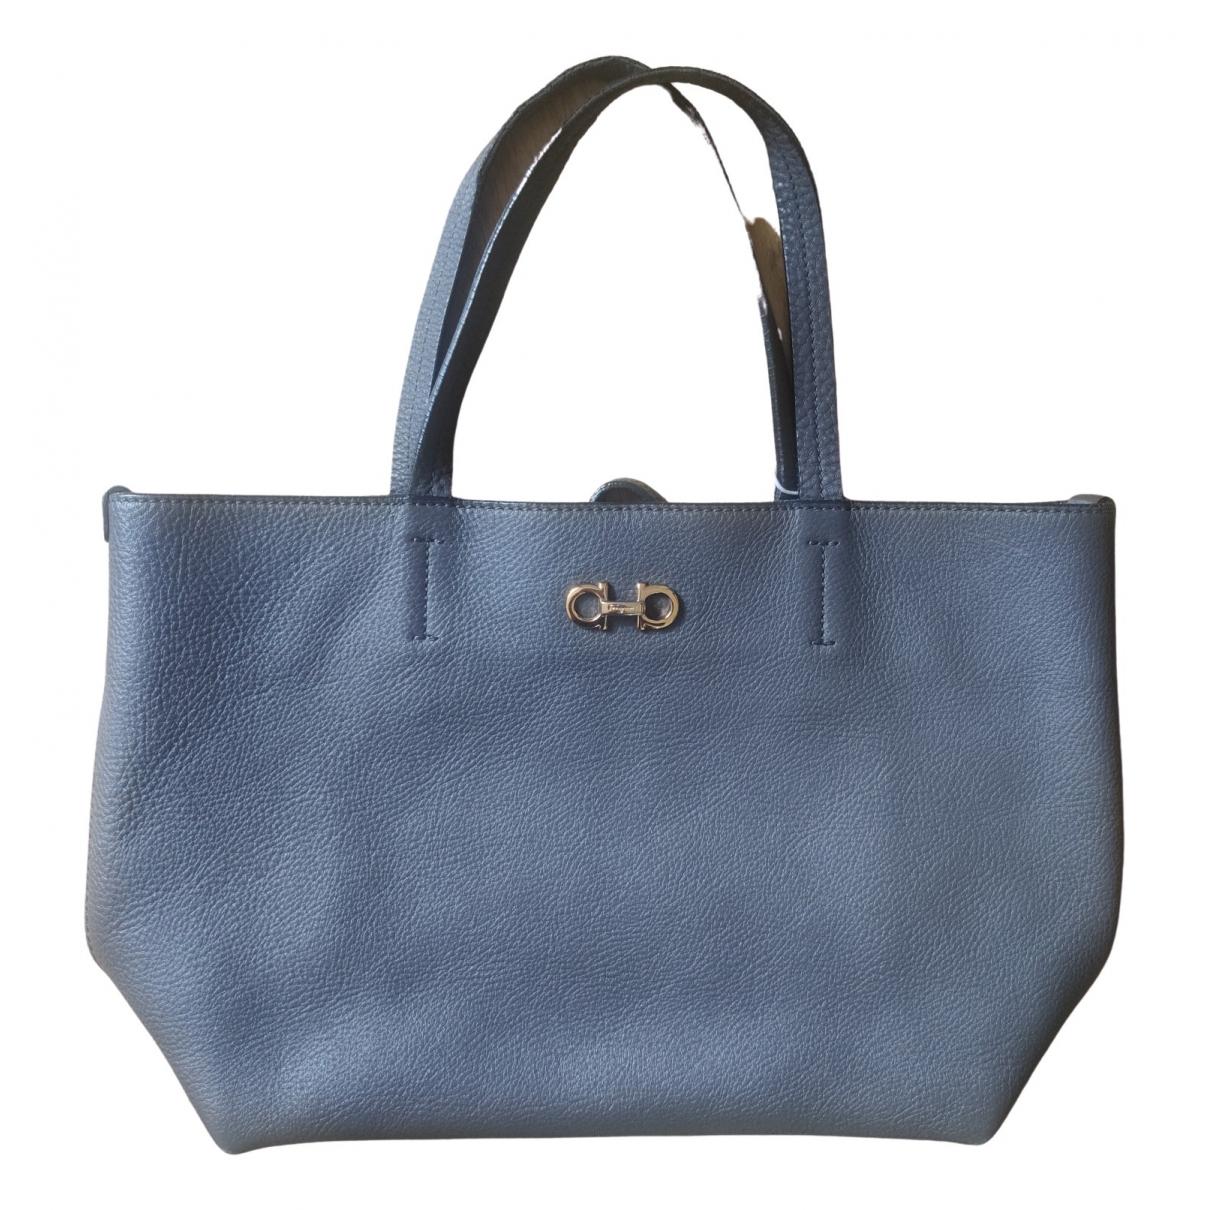 Salvatore Ferragamo \N Grey Leather handbag for Women \N